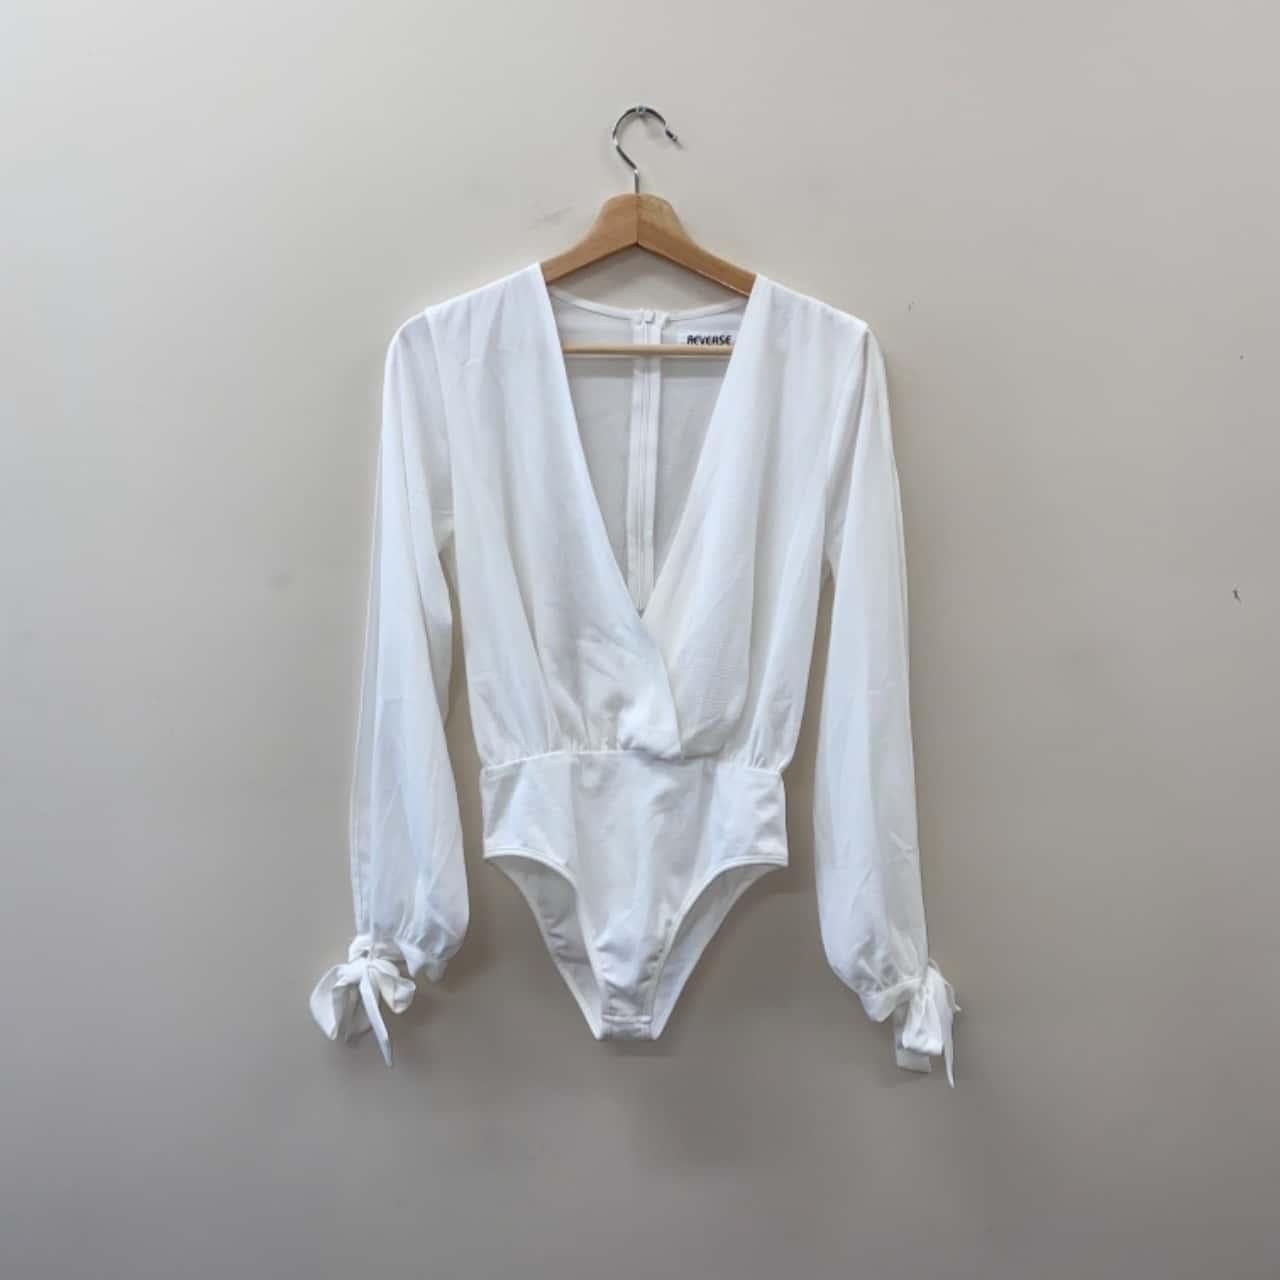 ** REDUCED ** Reverse Women's Size S White Long Sleeve Bodysuit